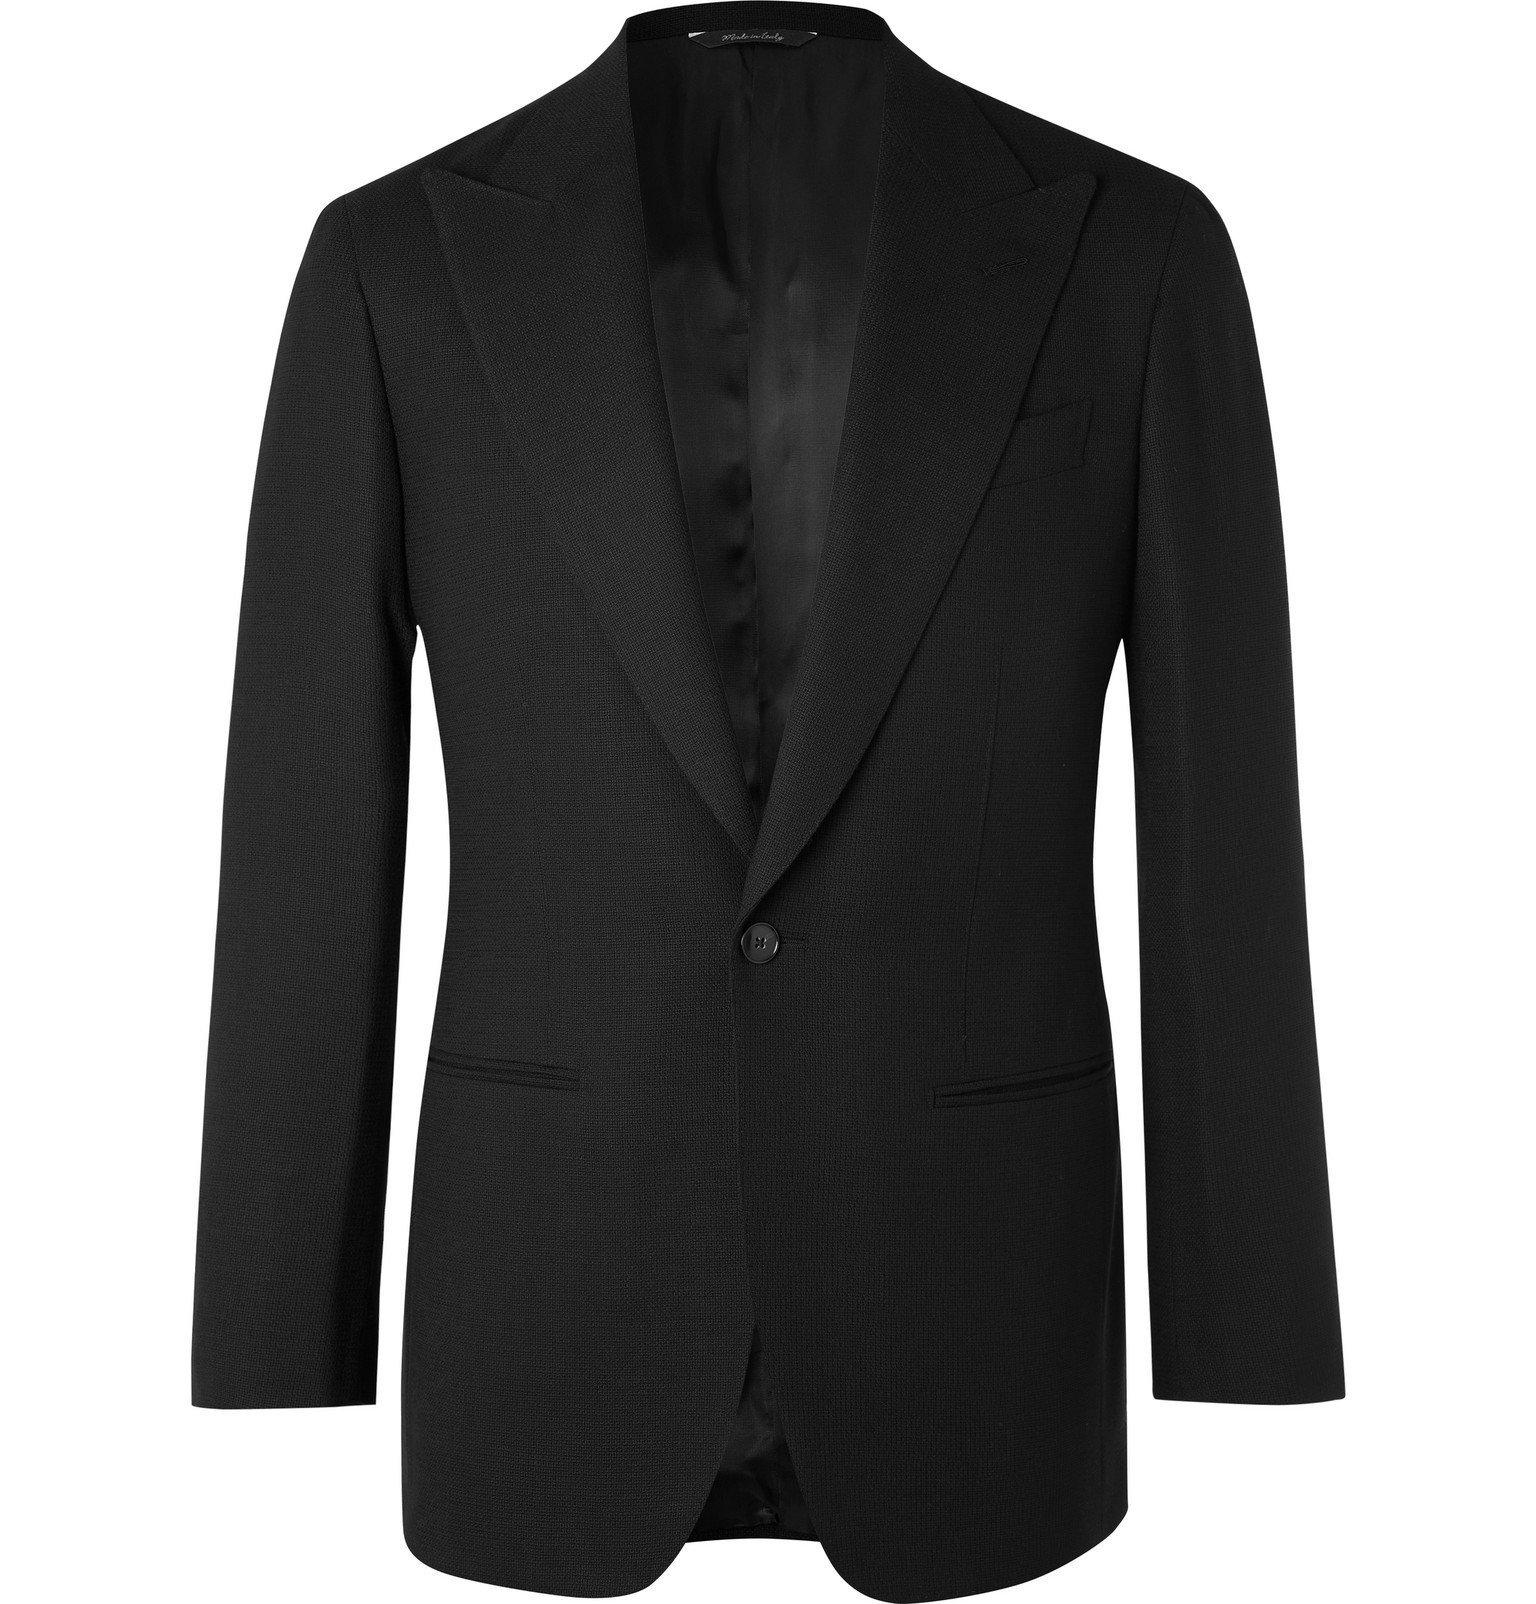 Saman Amel - Black Slim-Fit Wool-Hopsack Tuxedo Jacket - Black